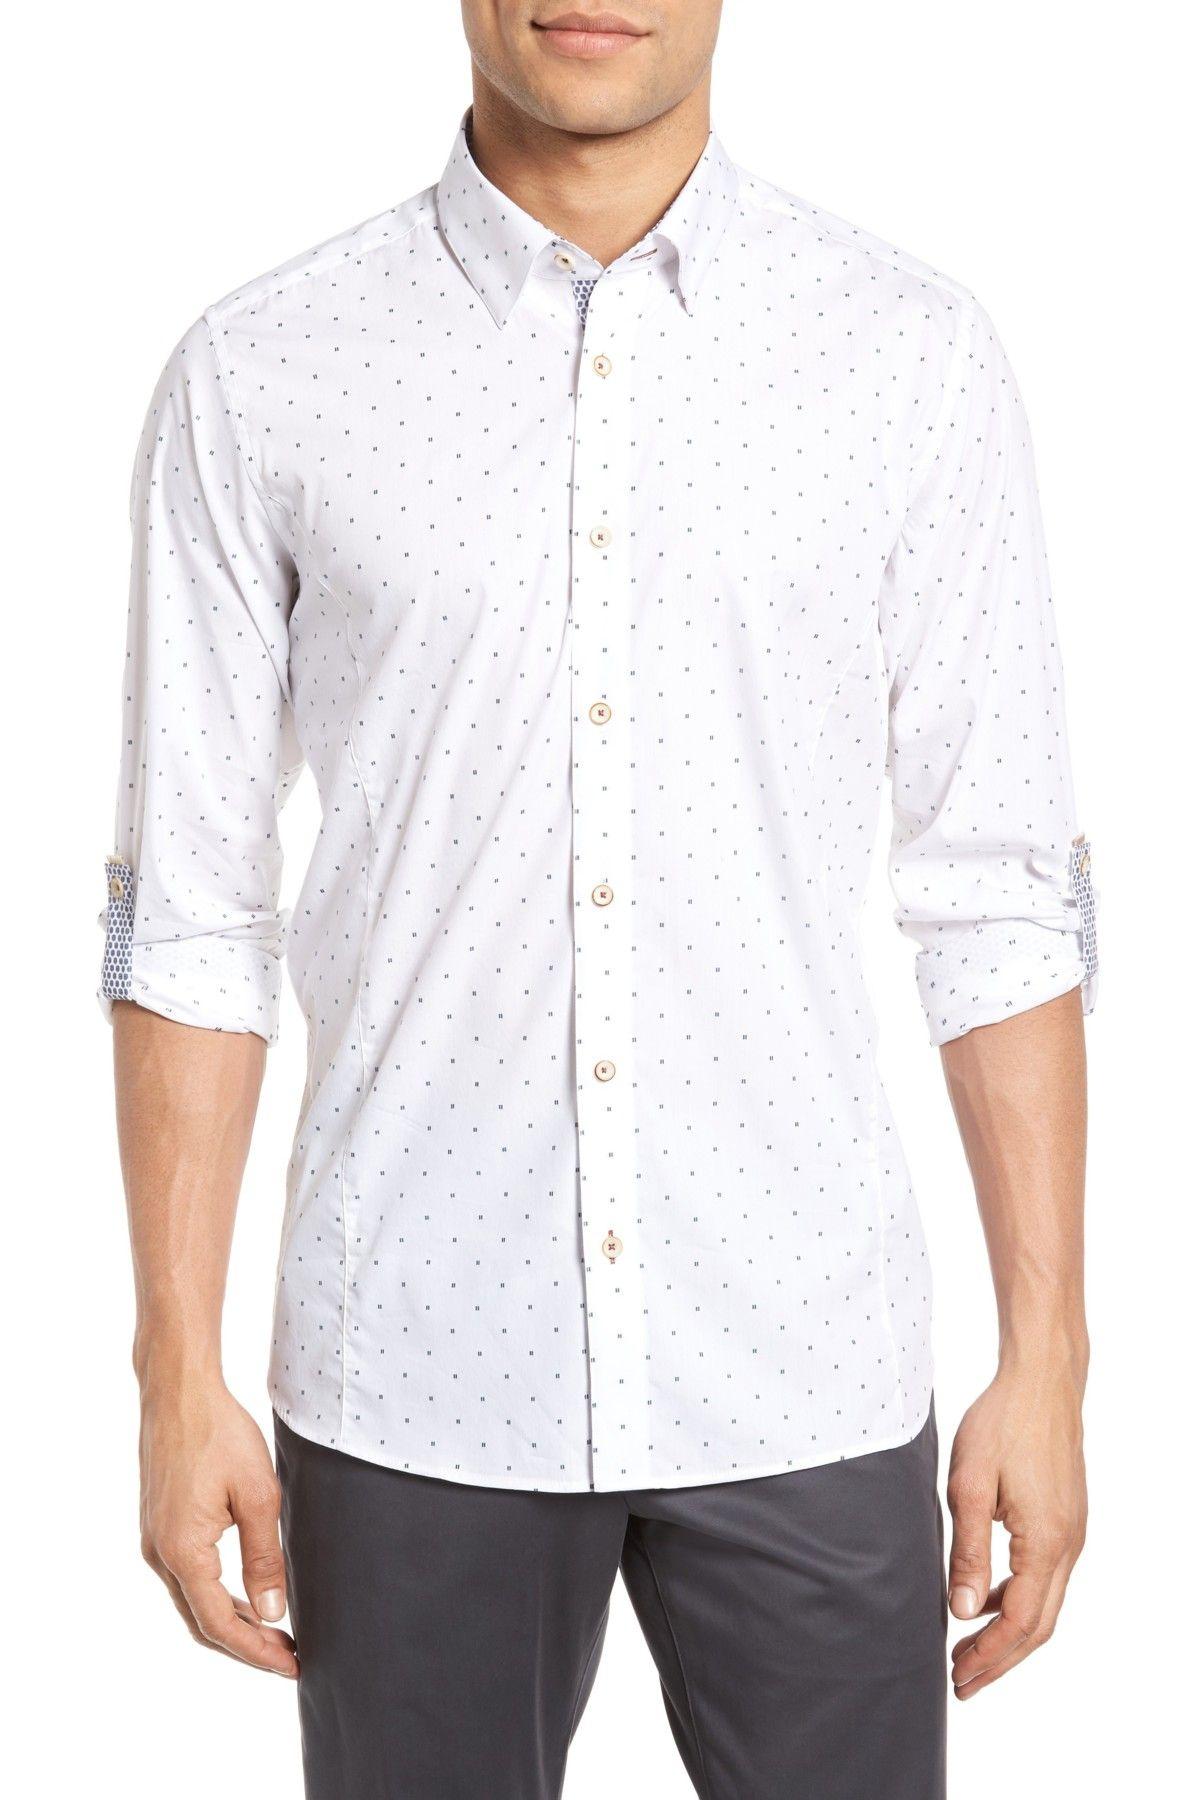 Yellow dress shirt men  Eethan Extra Slim Fit Shirt  Products